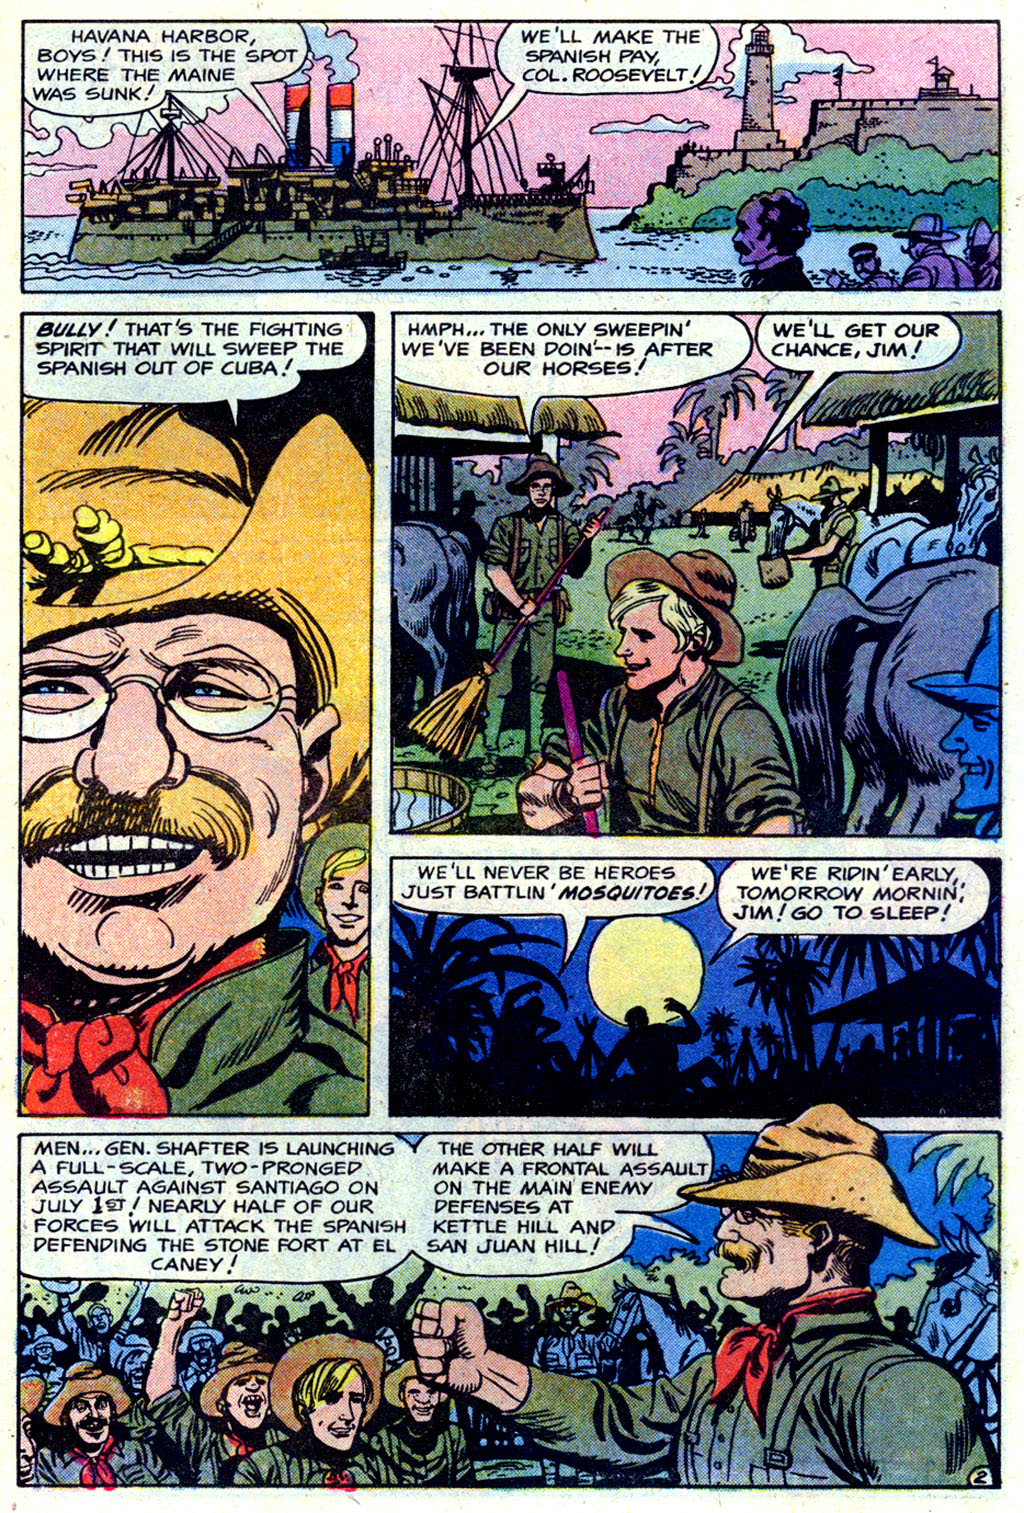 Read online Sgt. Rock comic -  Issue #337 - 16